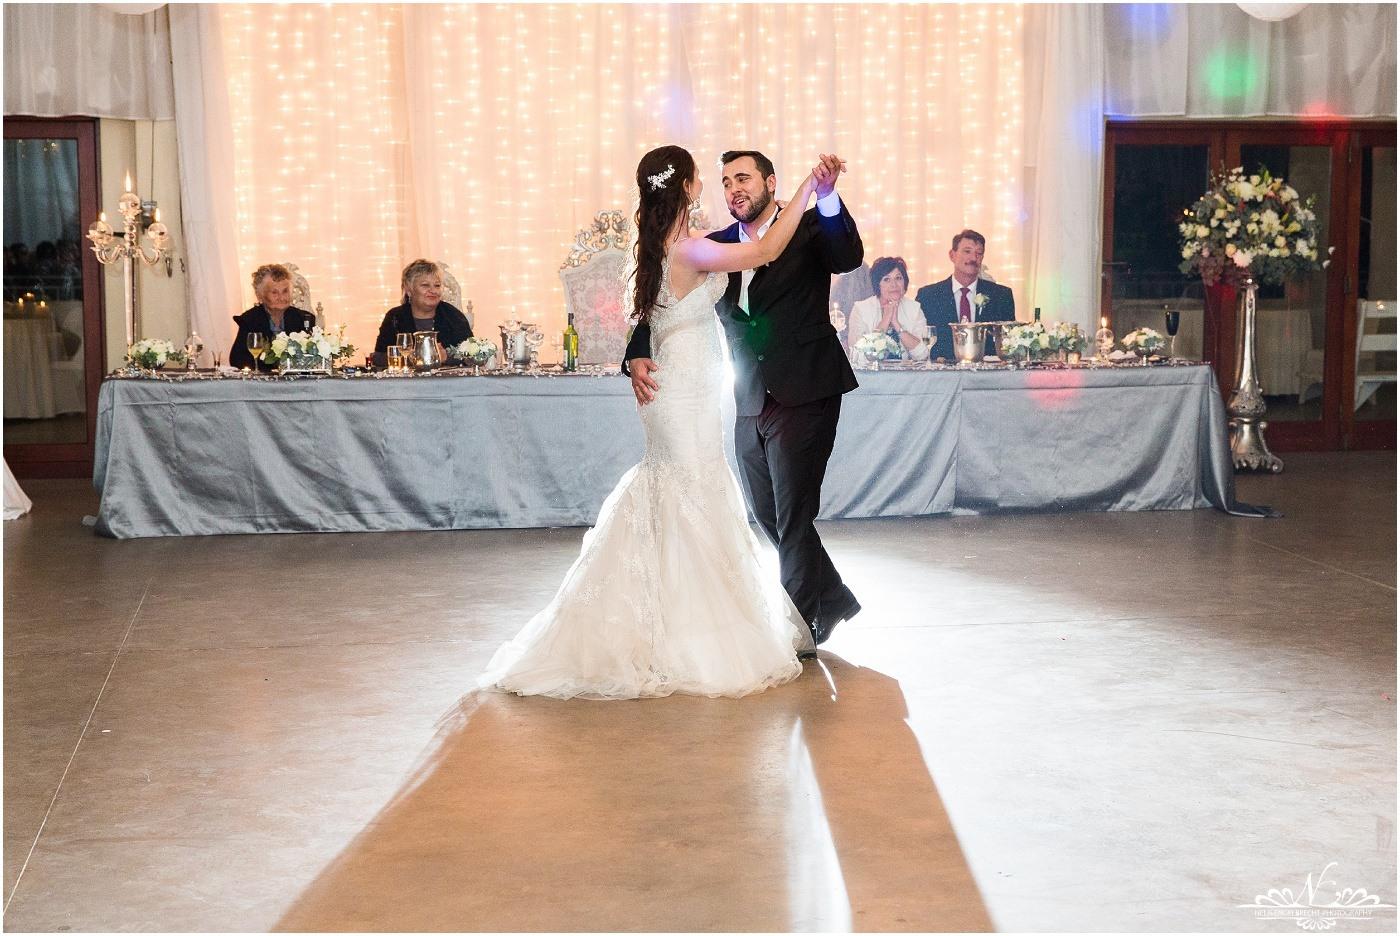 Eensgezind-Wedding-Photos-Nelis-Engelbrecht-Photography-197